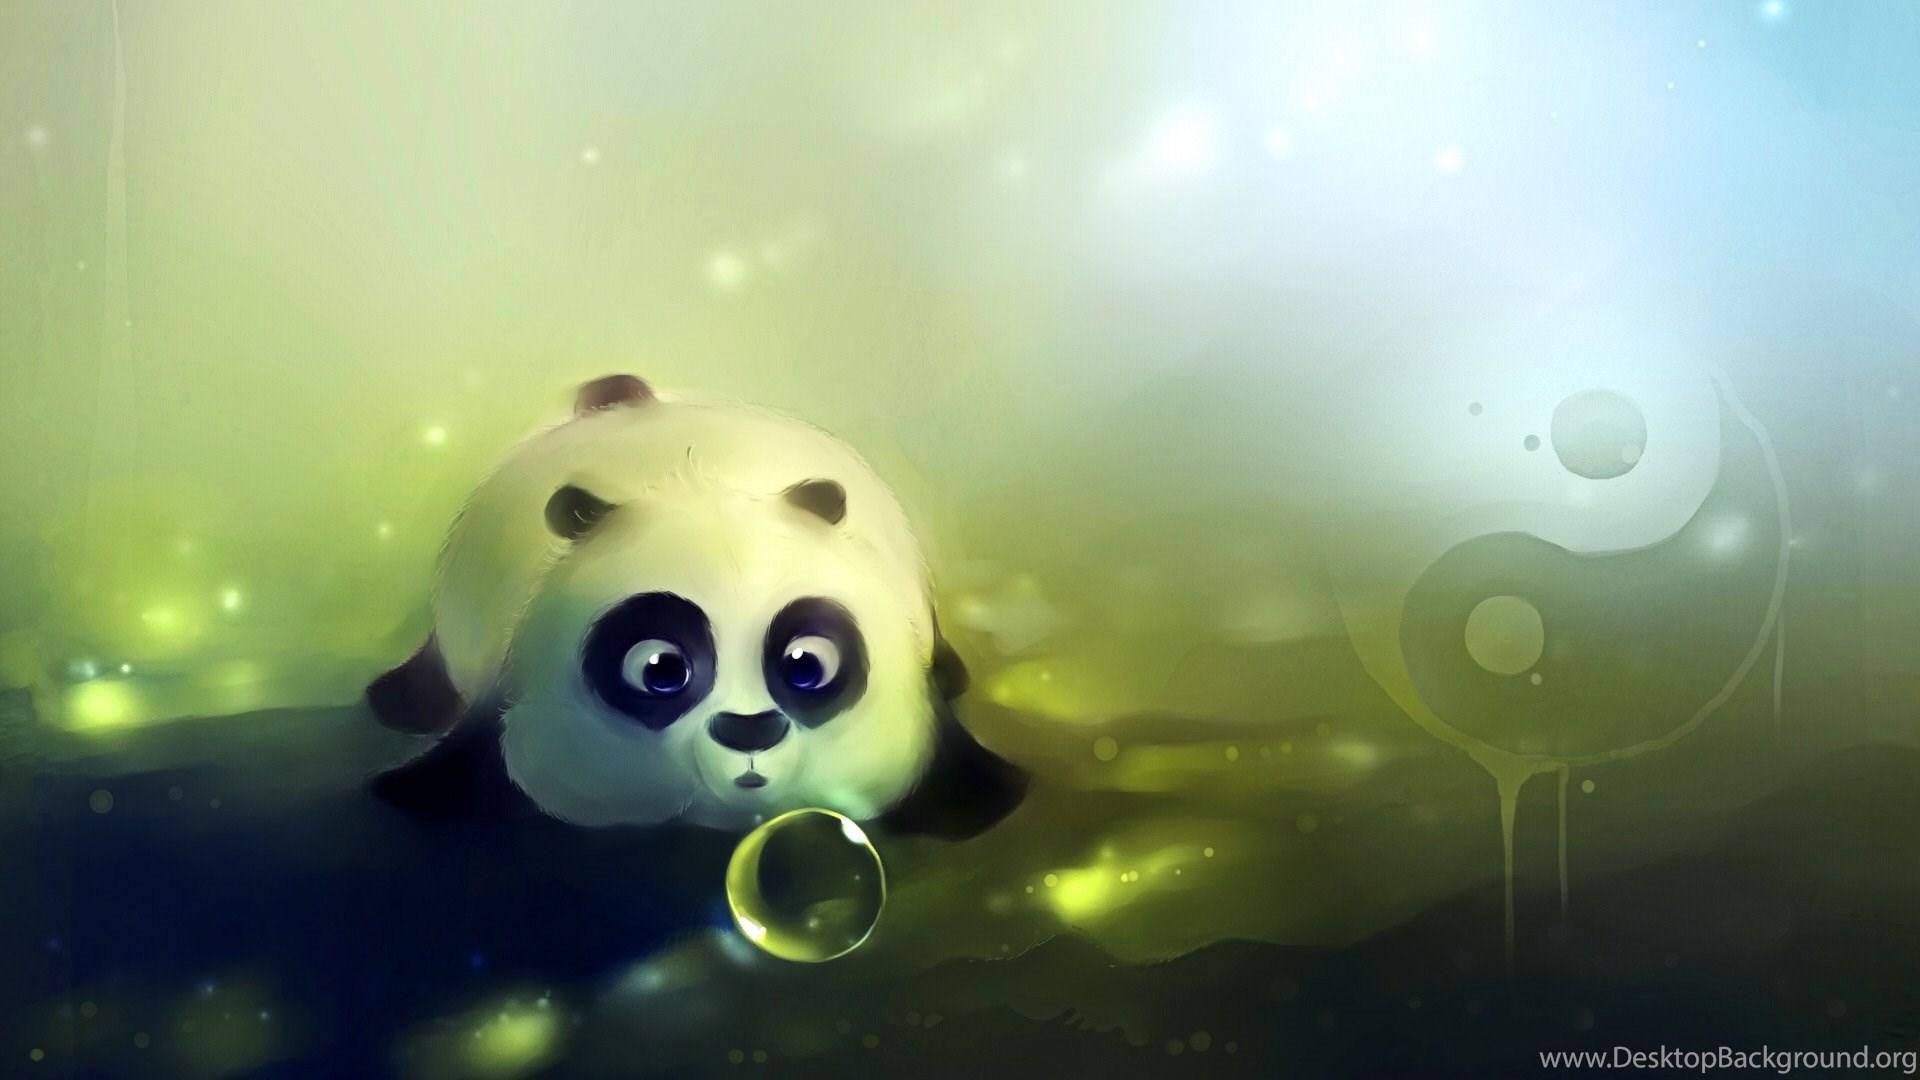 Cute Panda Animation Wallpapers Windows ...